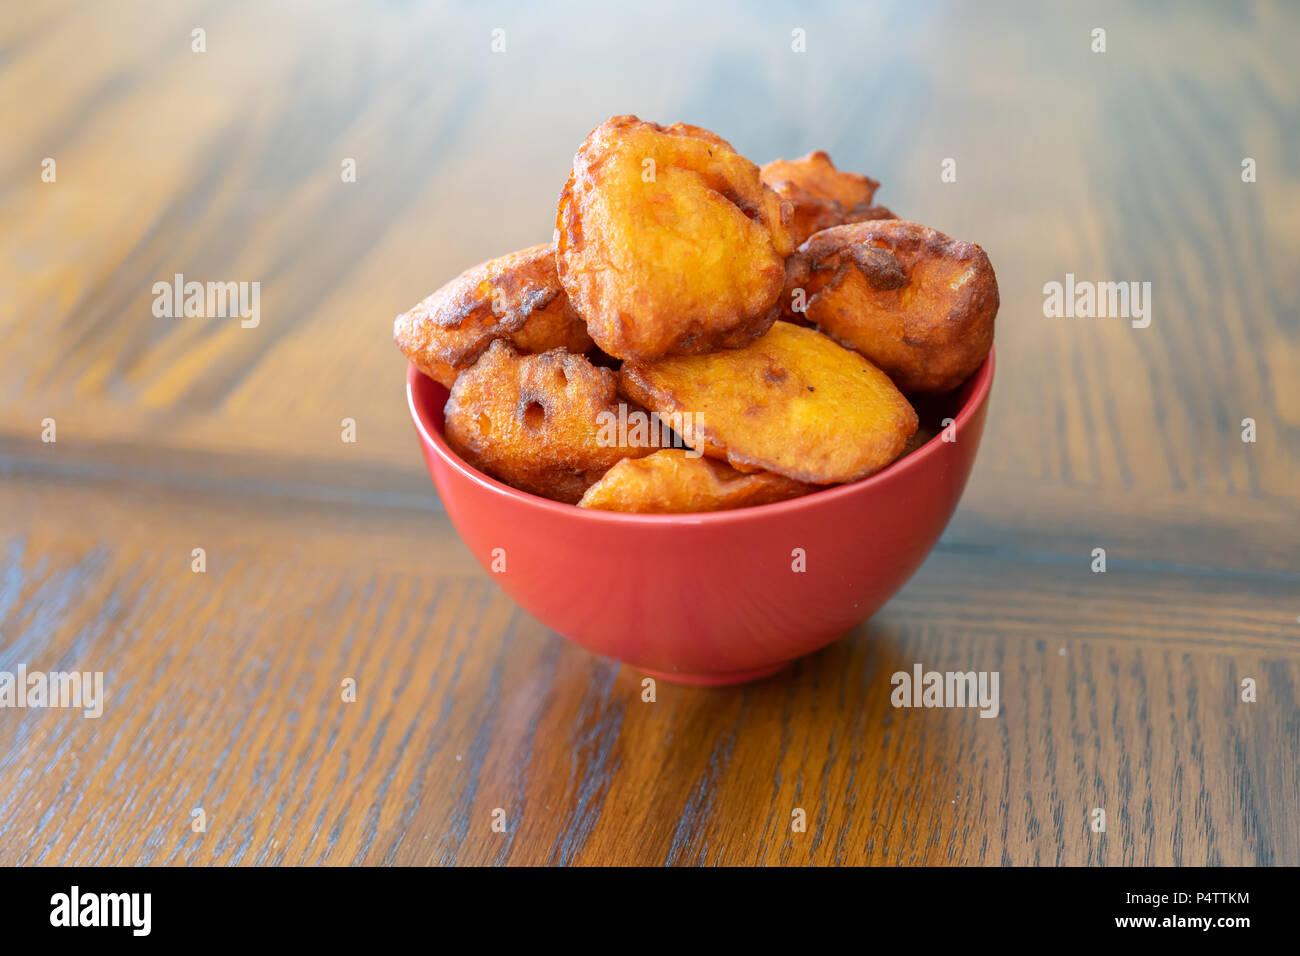 Nigerian Deep Fried akara Ready to Eat - Stock Image